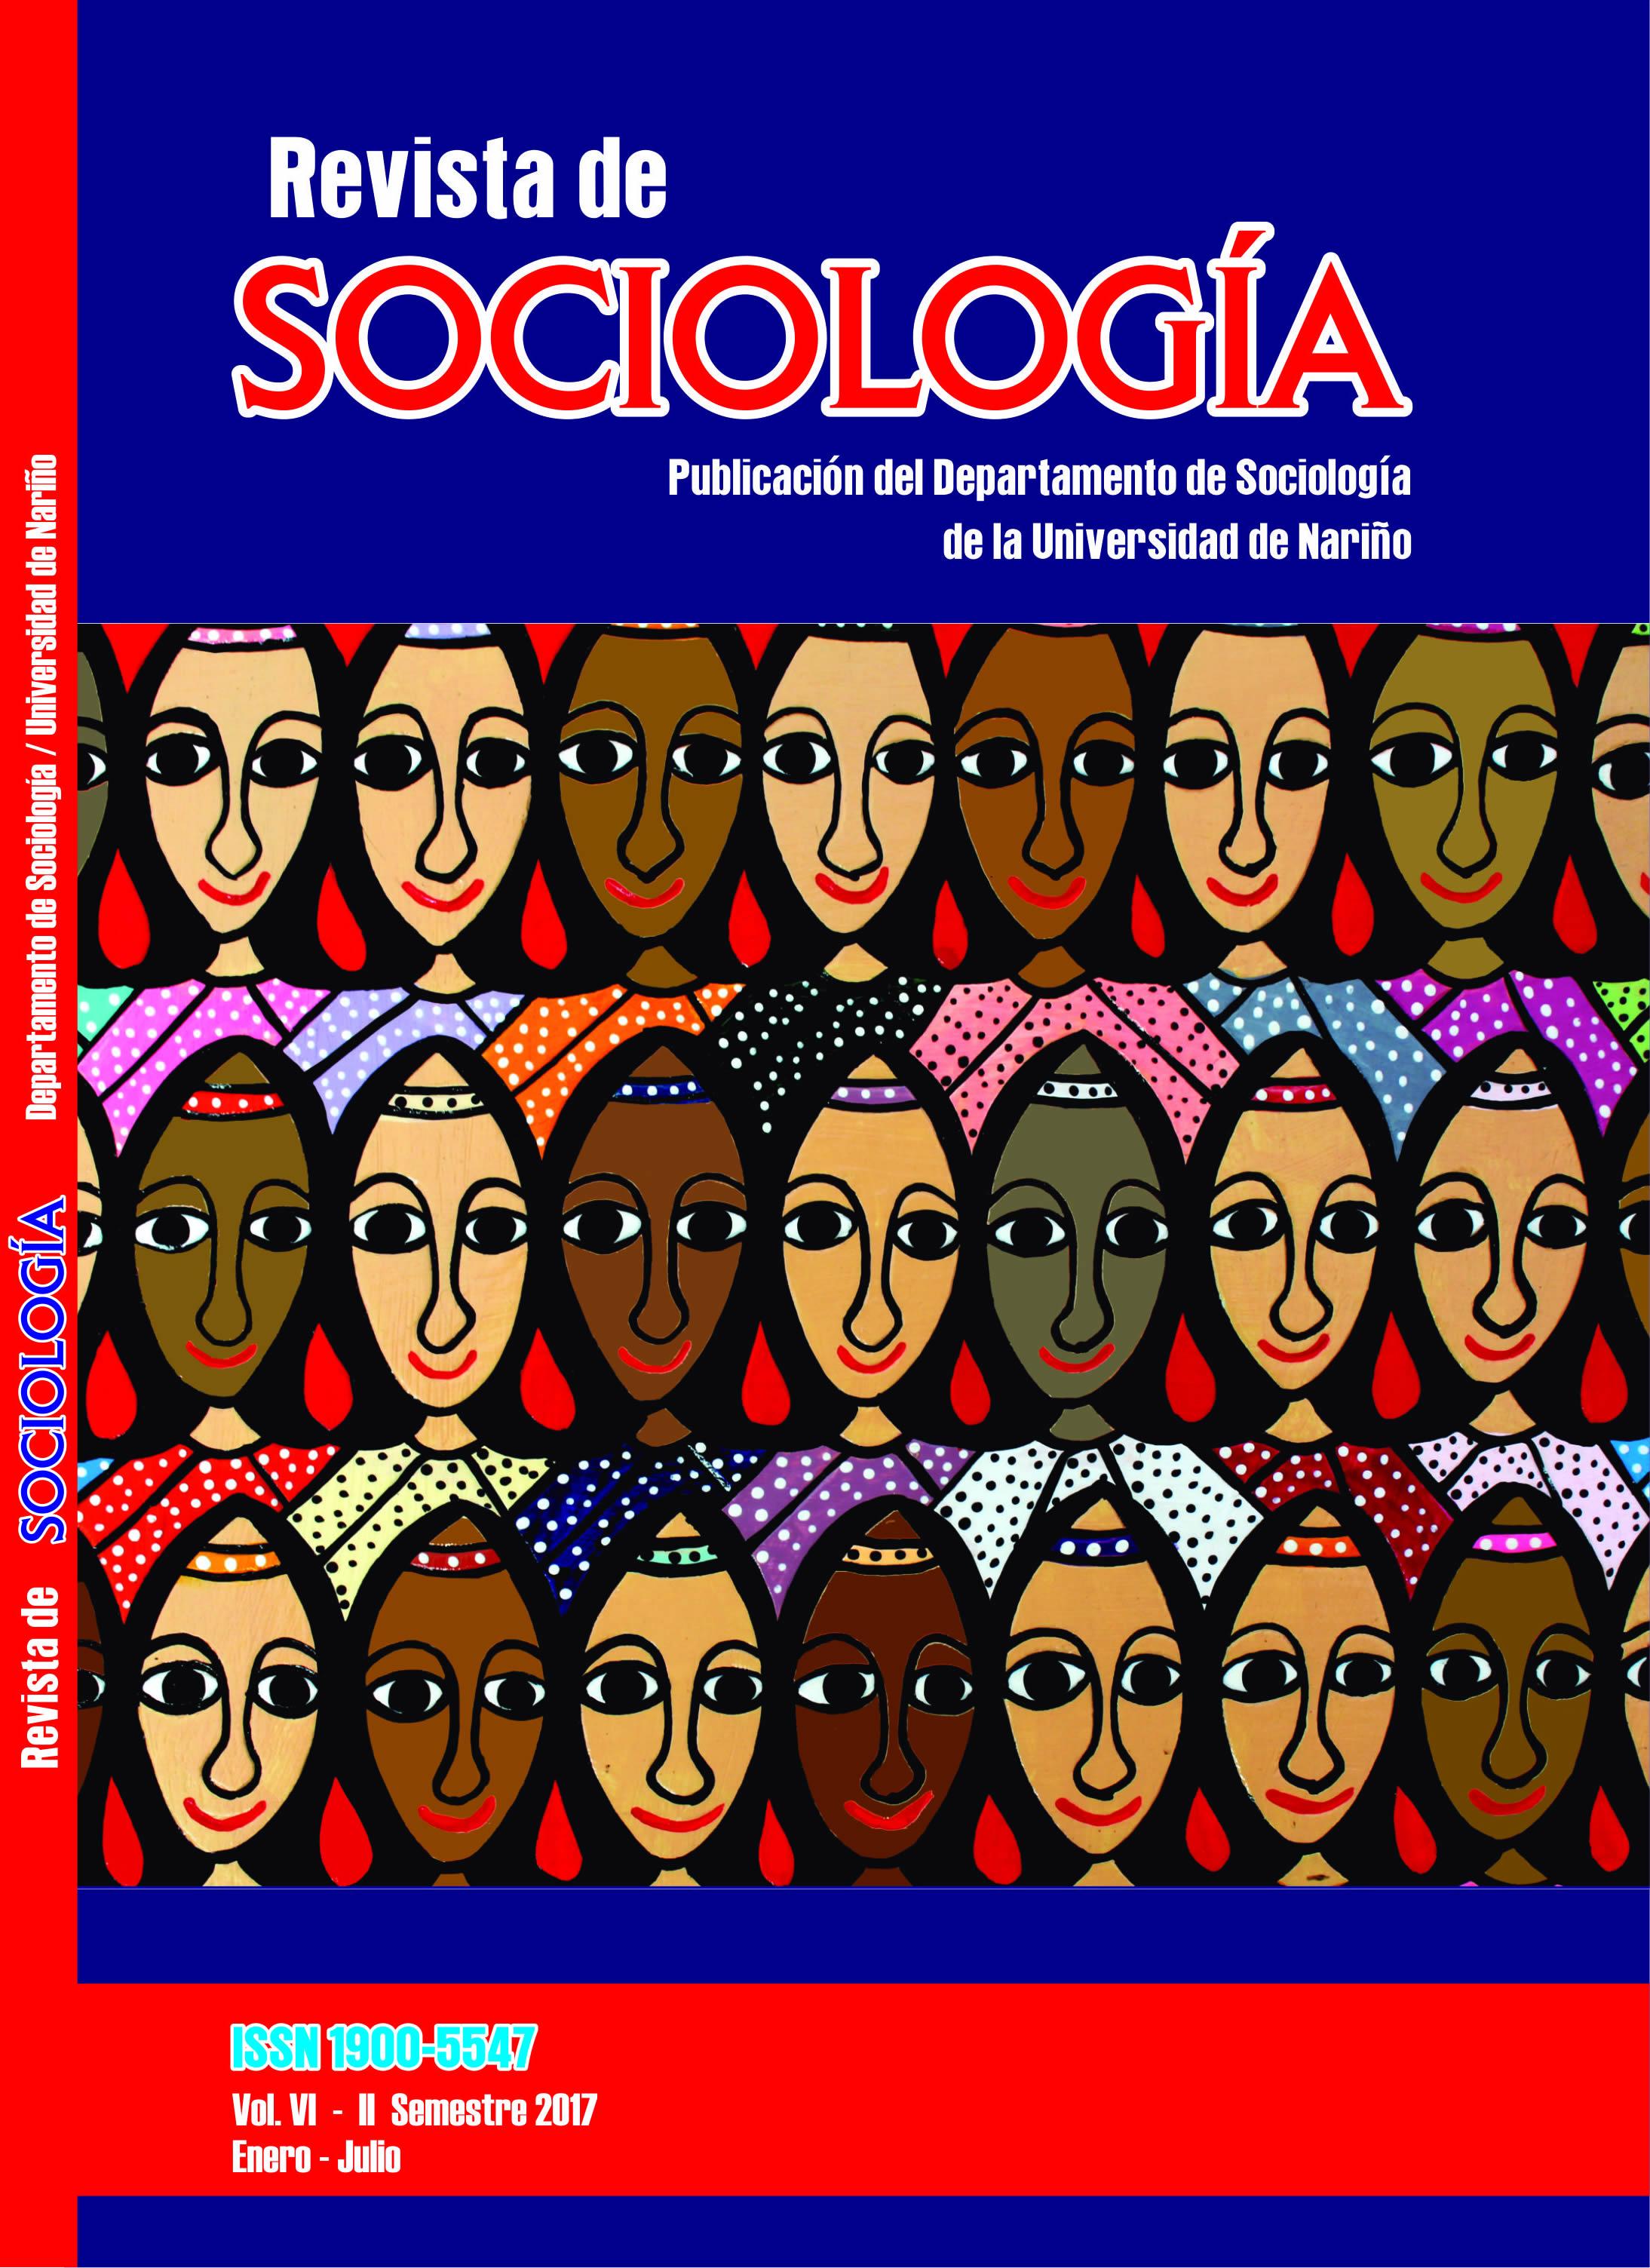 CARATULA-SOCIOLOGIA